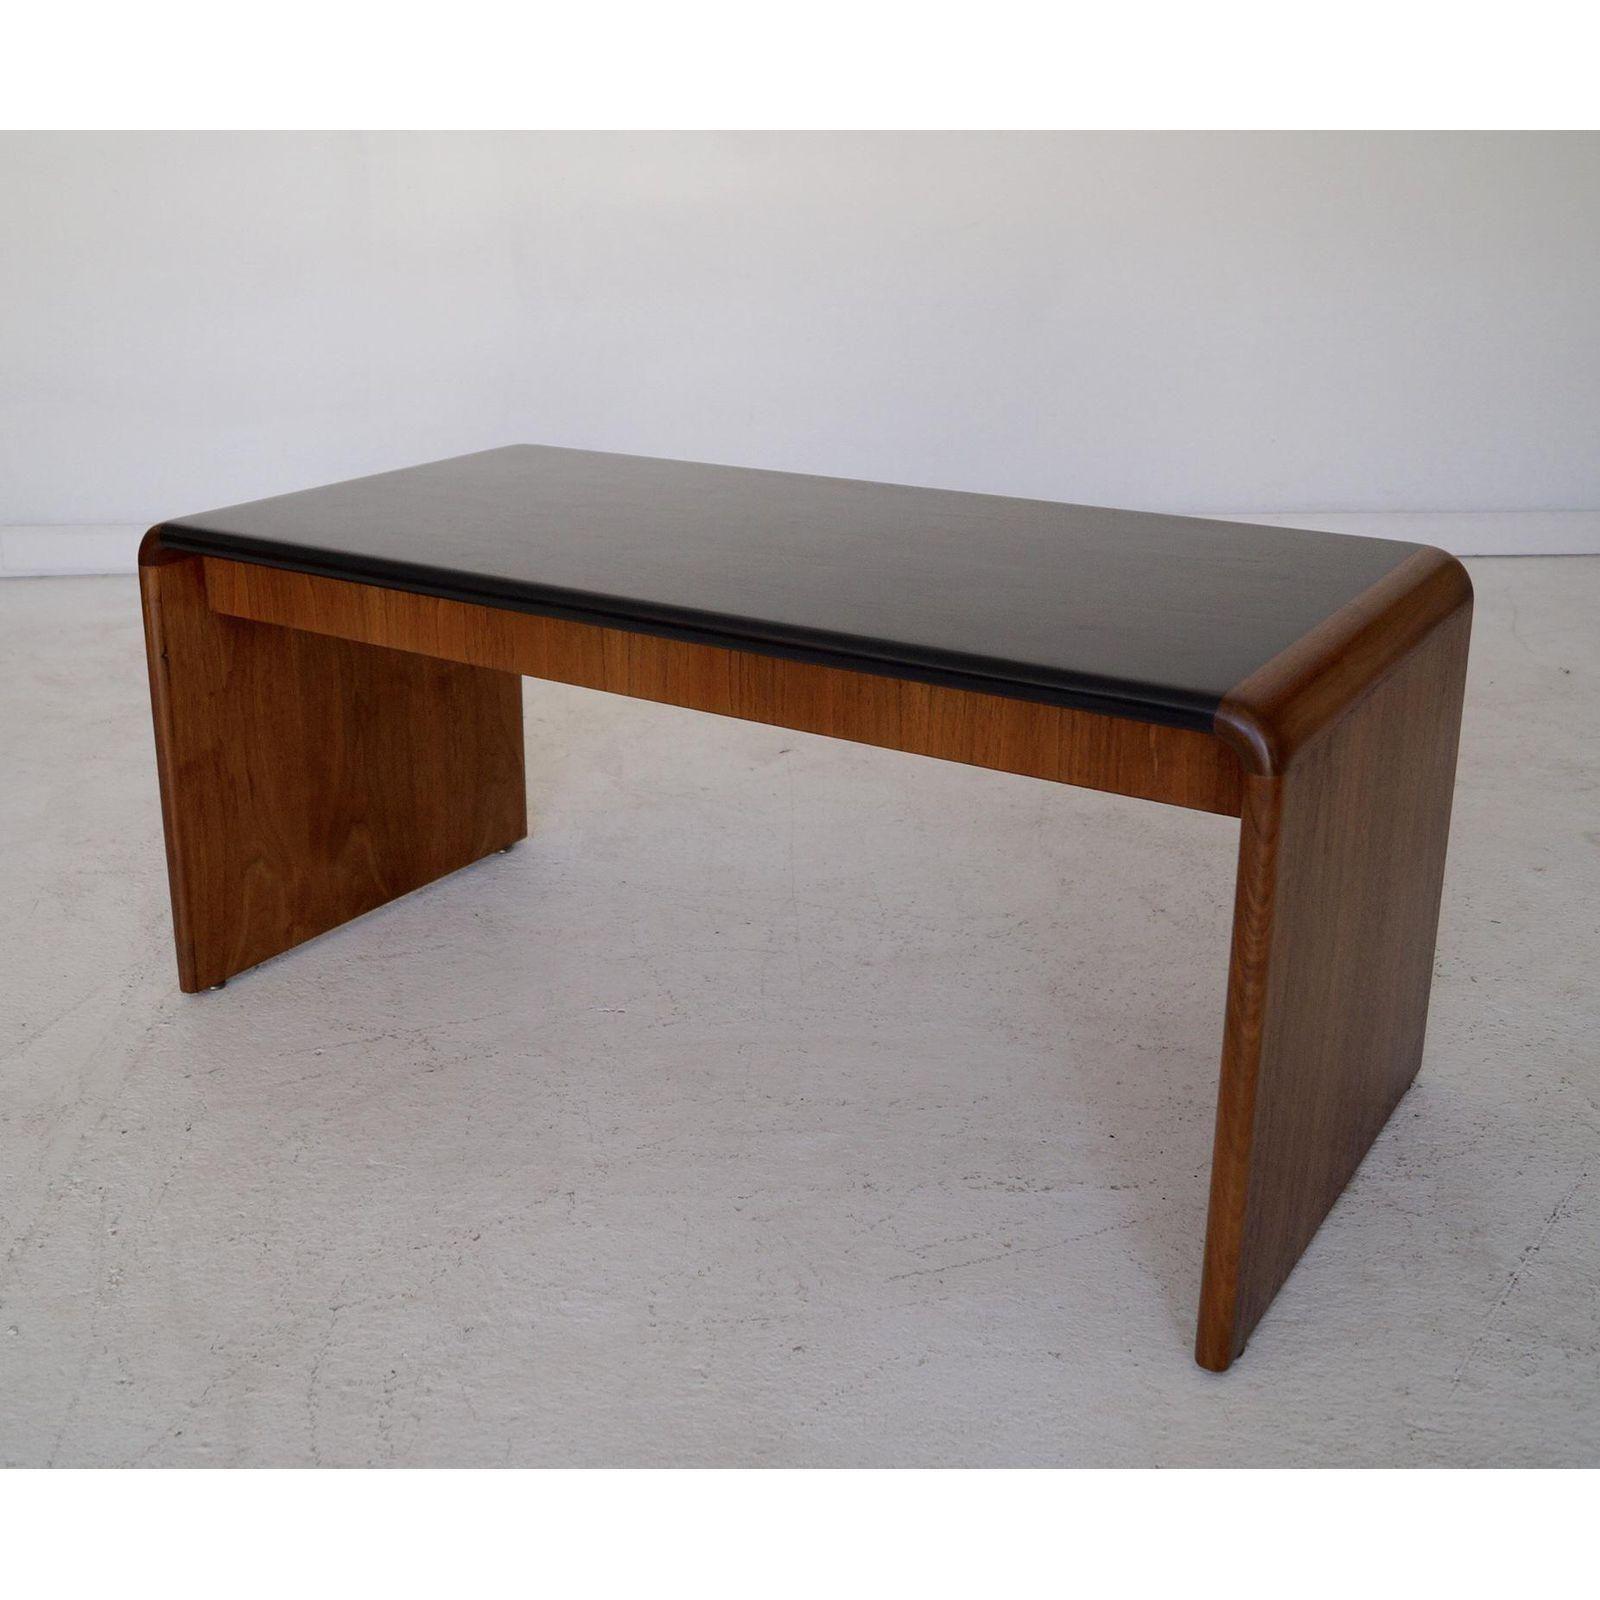 Fine Mid Century Teak Waterfall Edge Coffee Table Image 6 Of 11 Cjindustries Chair Design For Home Cjindustriesco